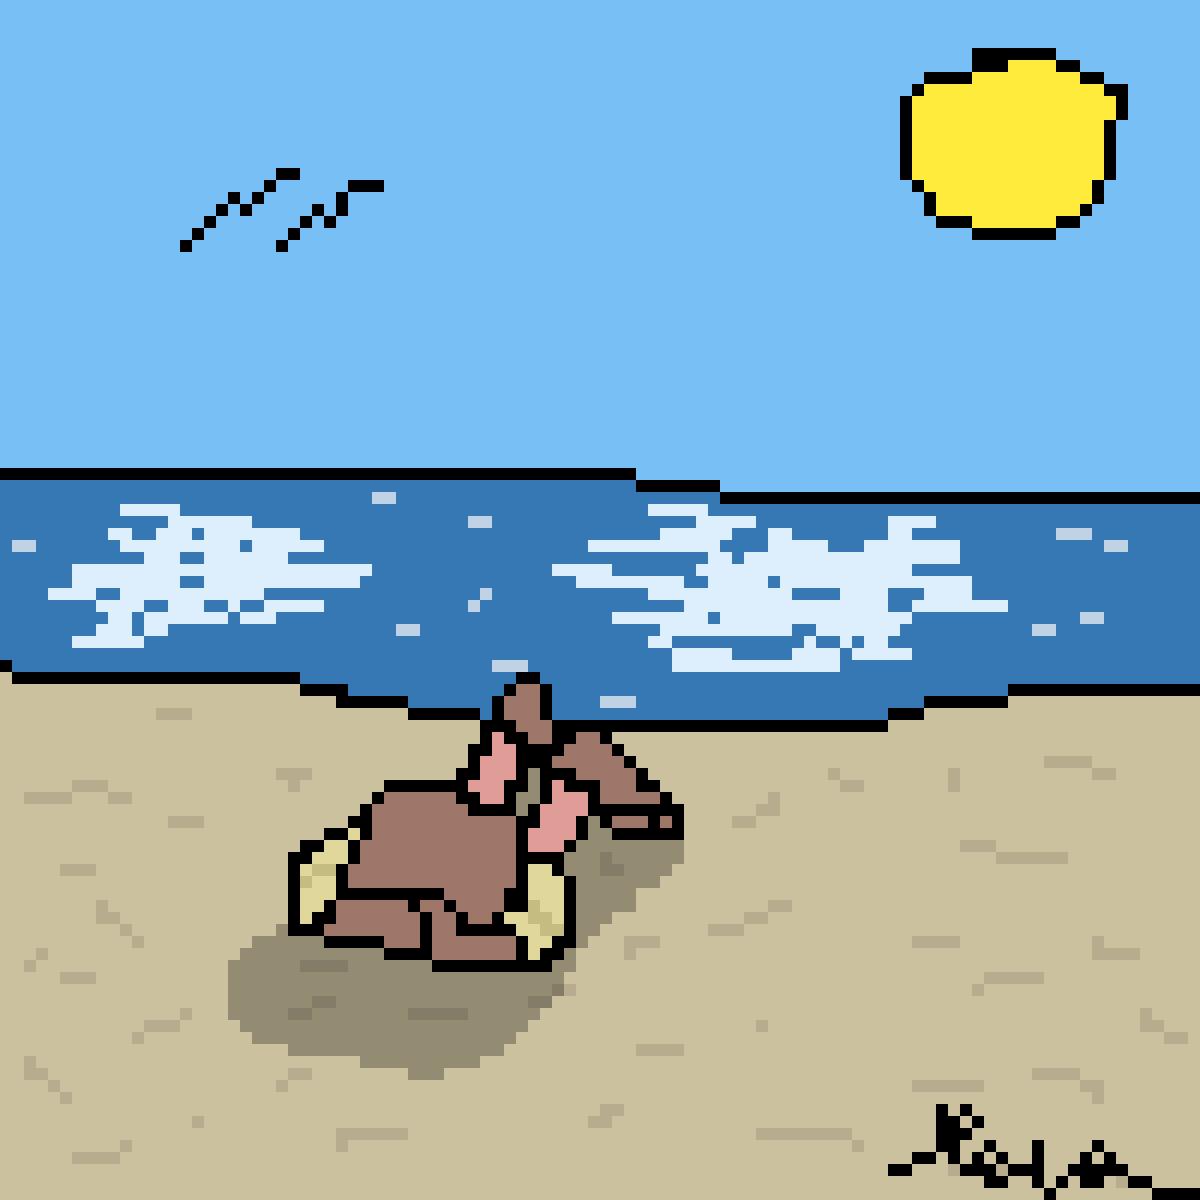 Seaside Sitdown by Mineninja